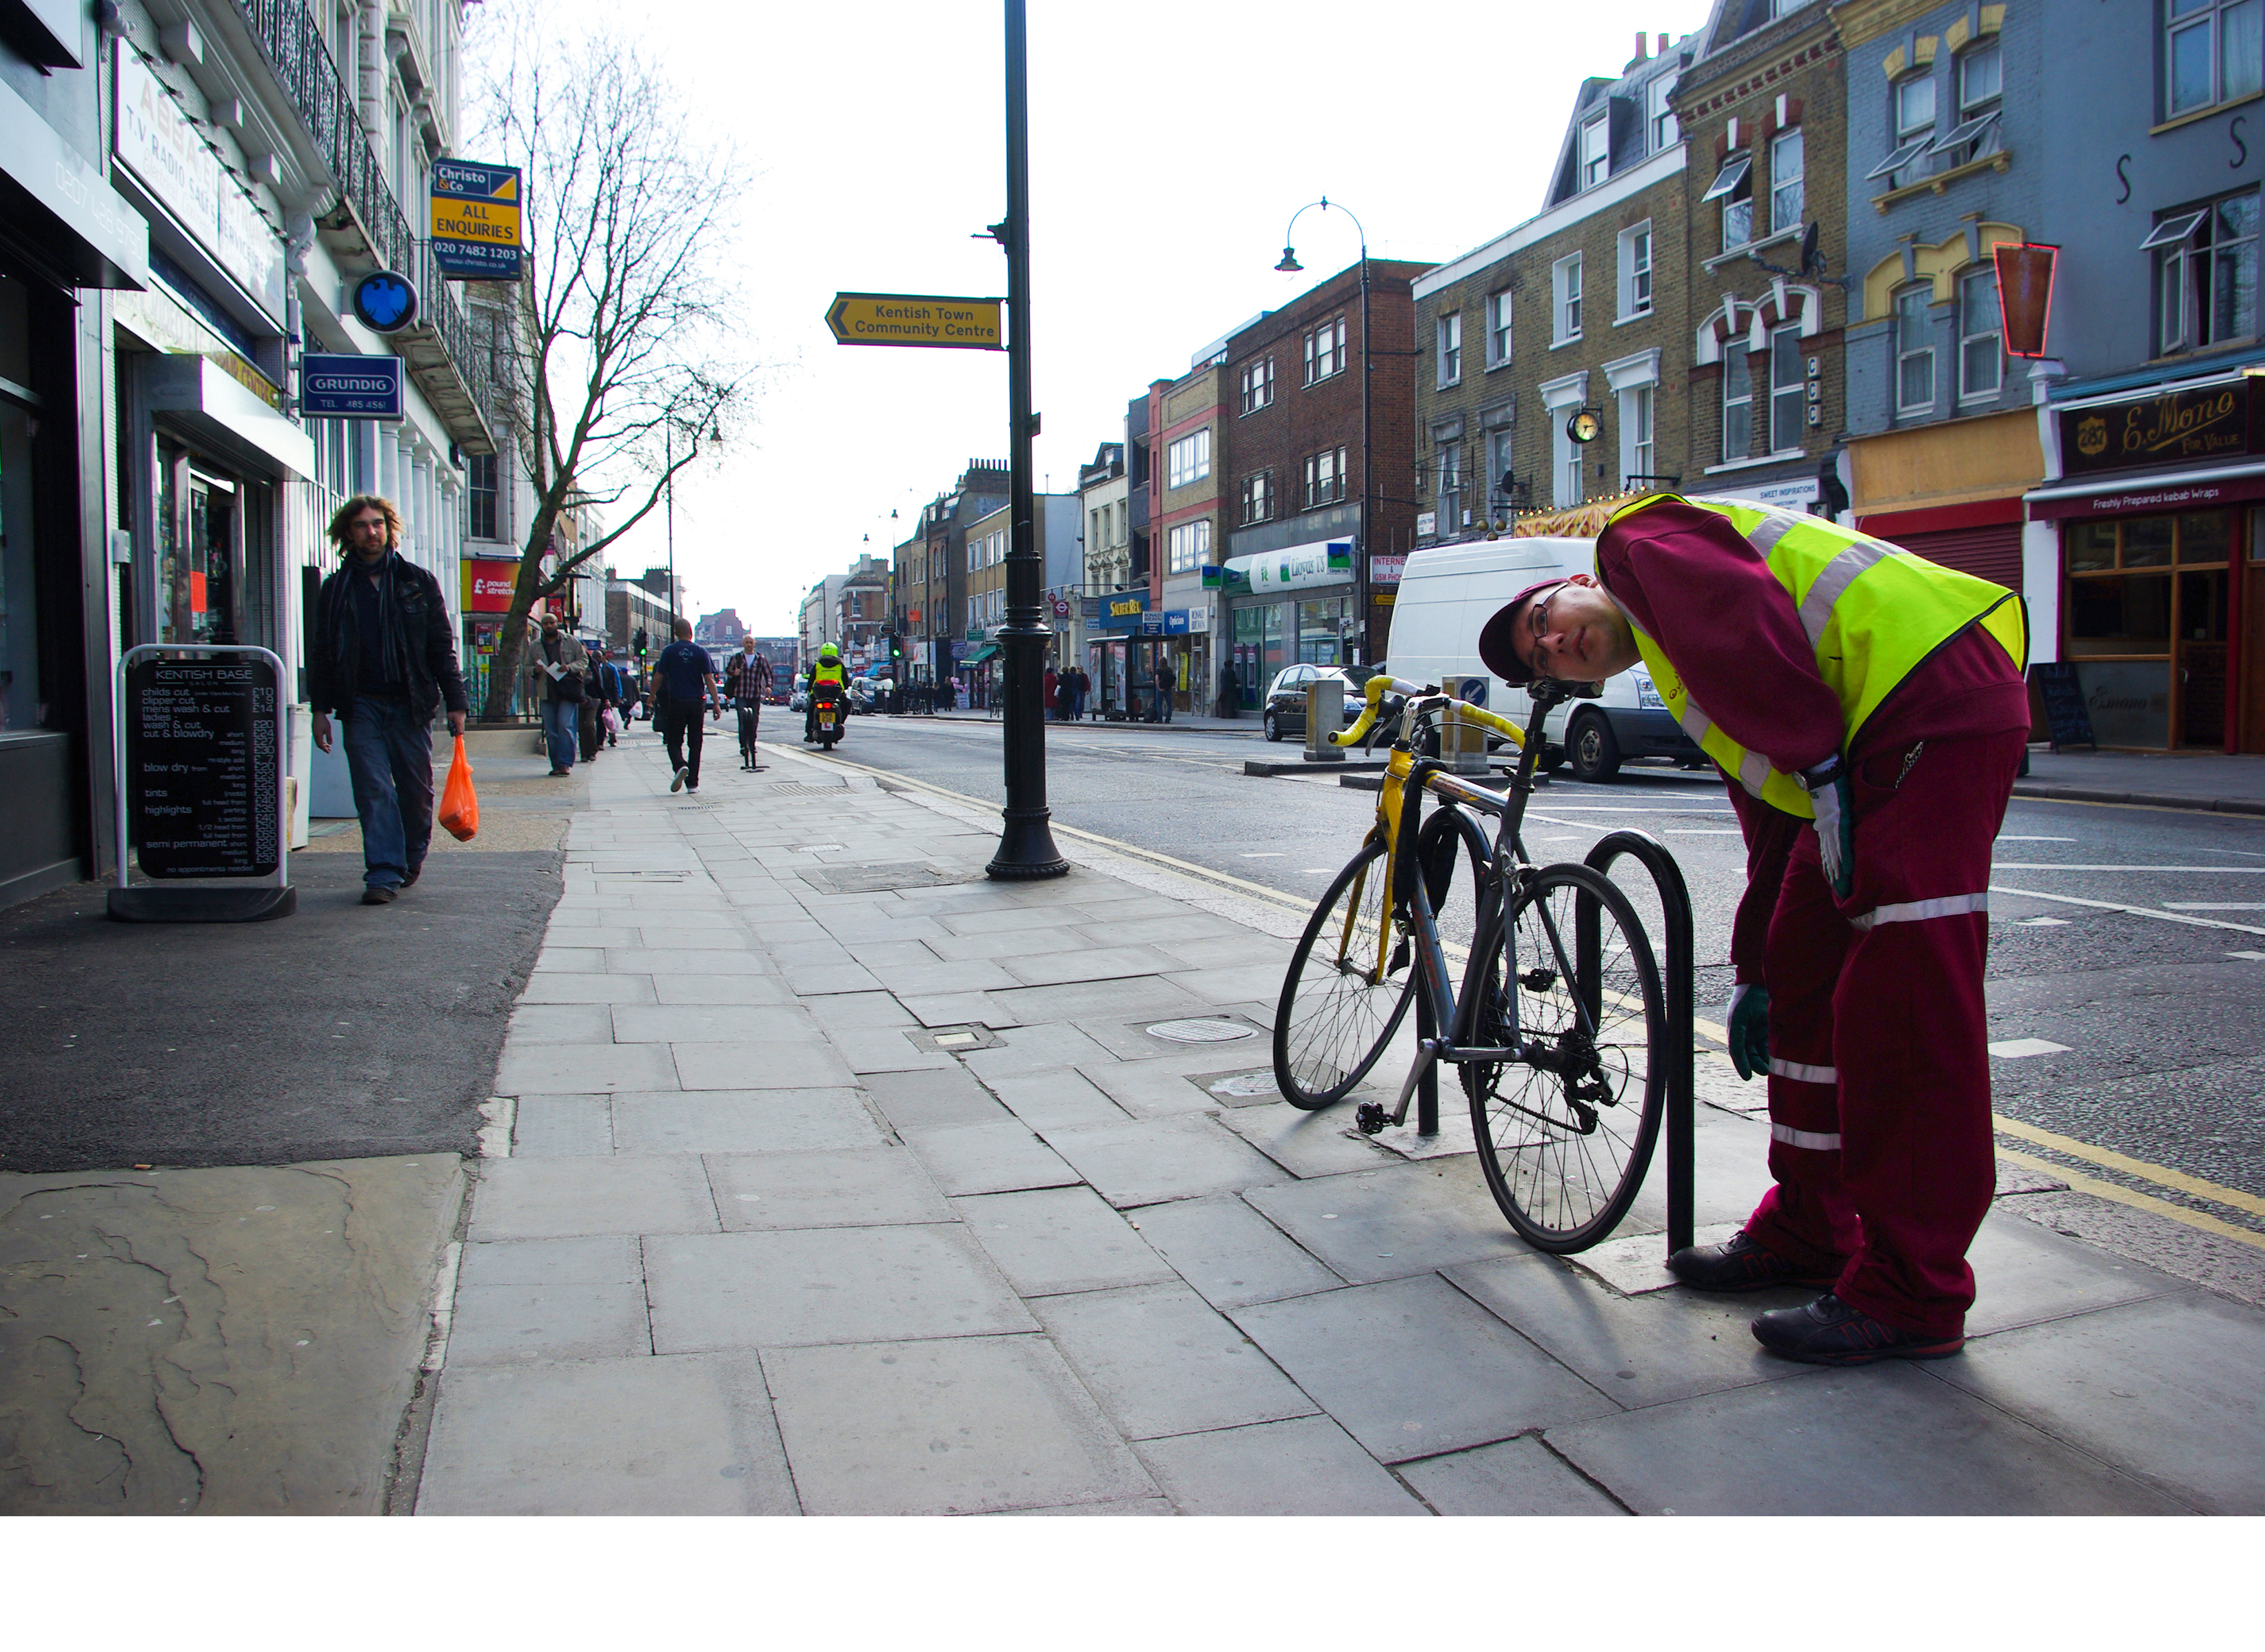 6 - Bicycle 2013, London UK, C Print